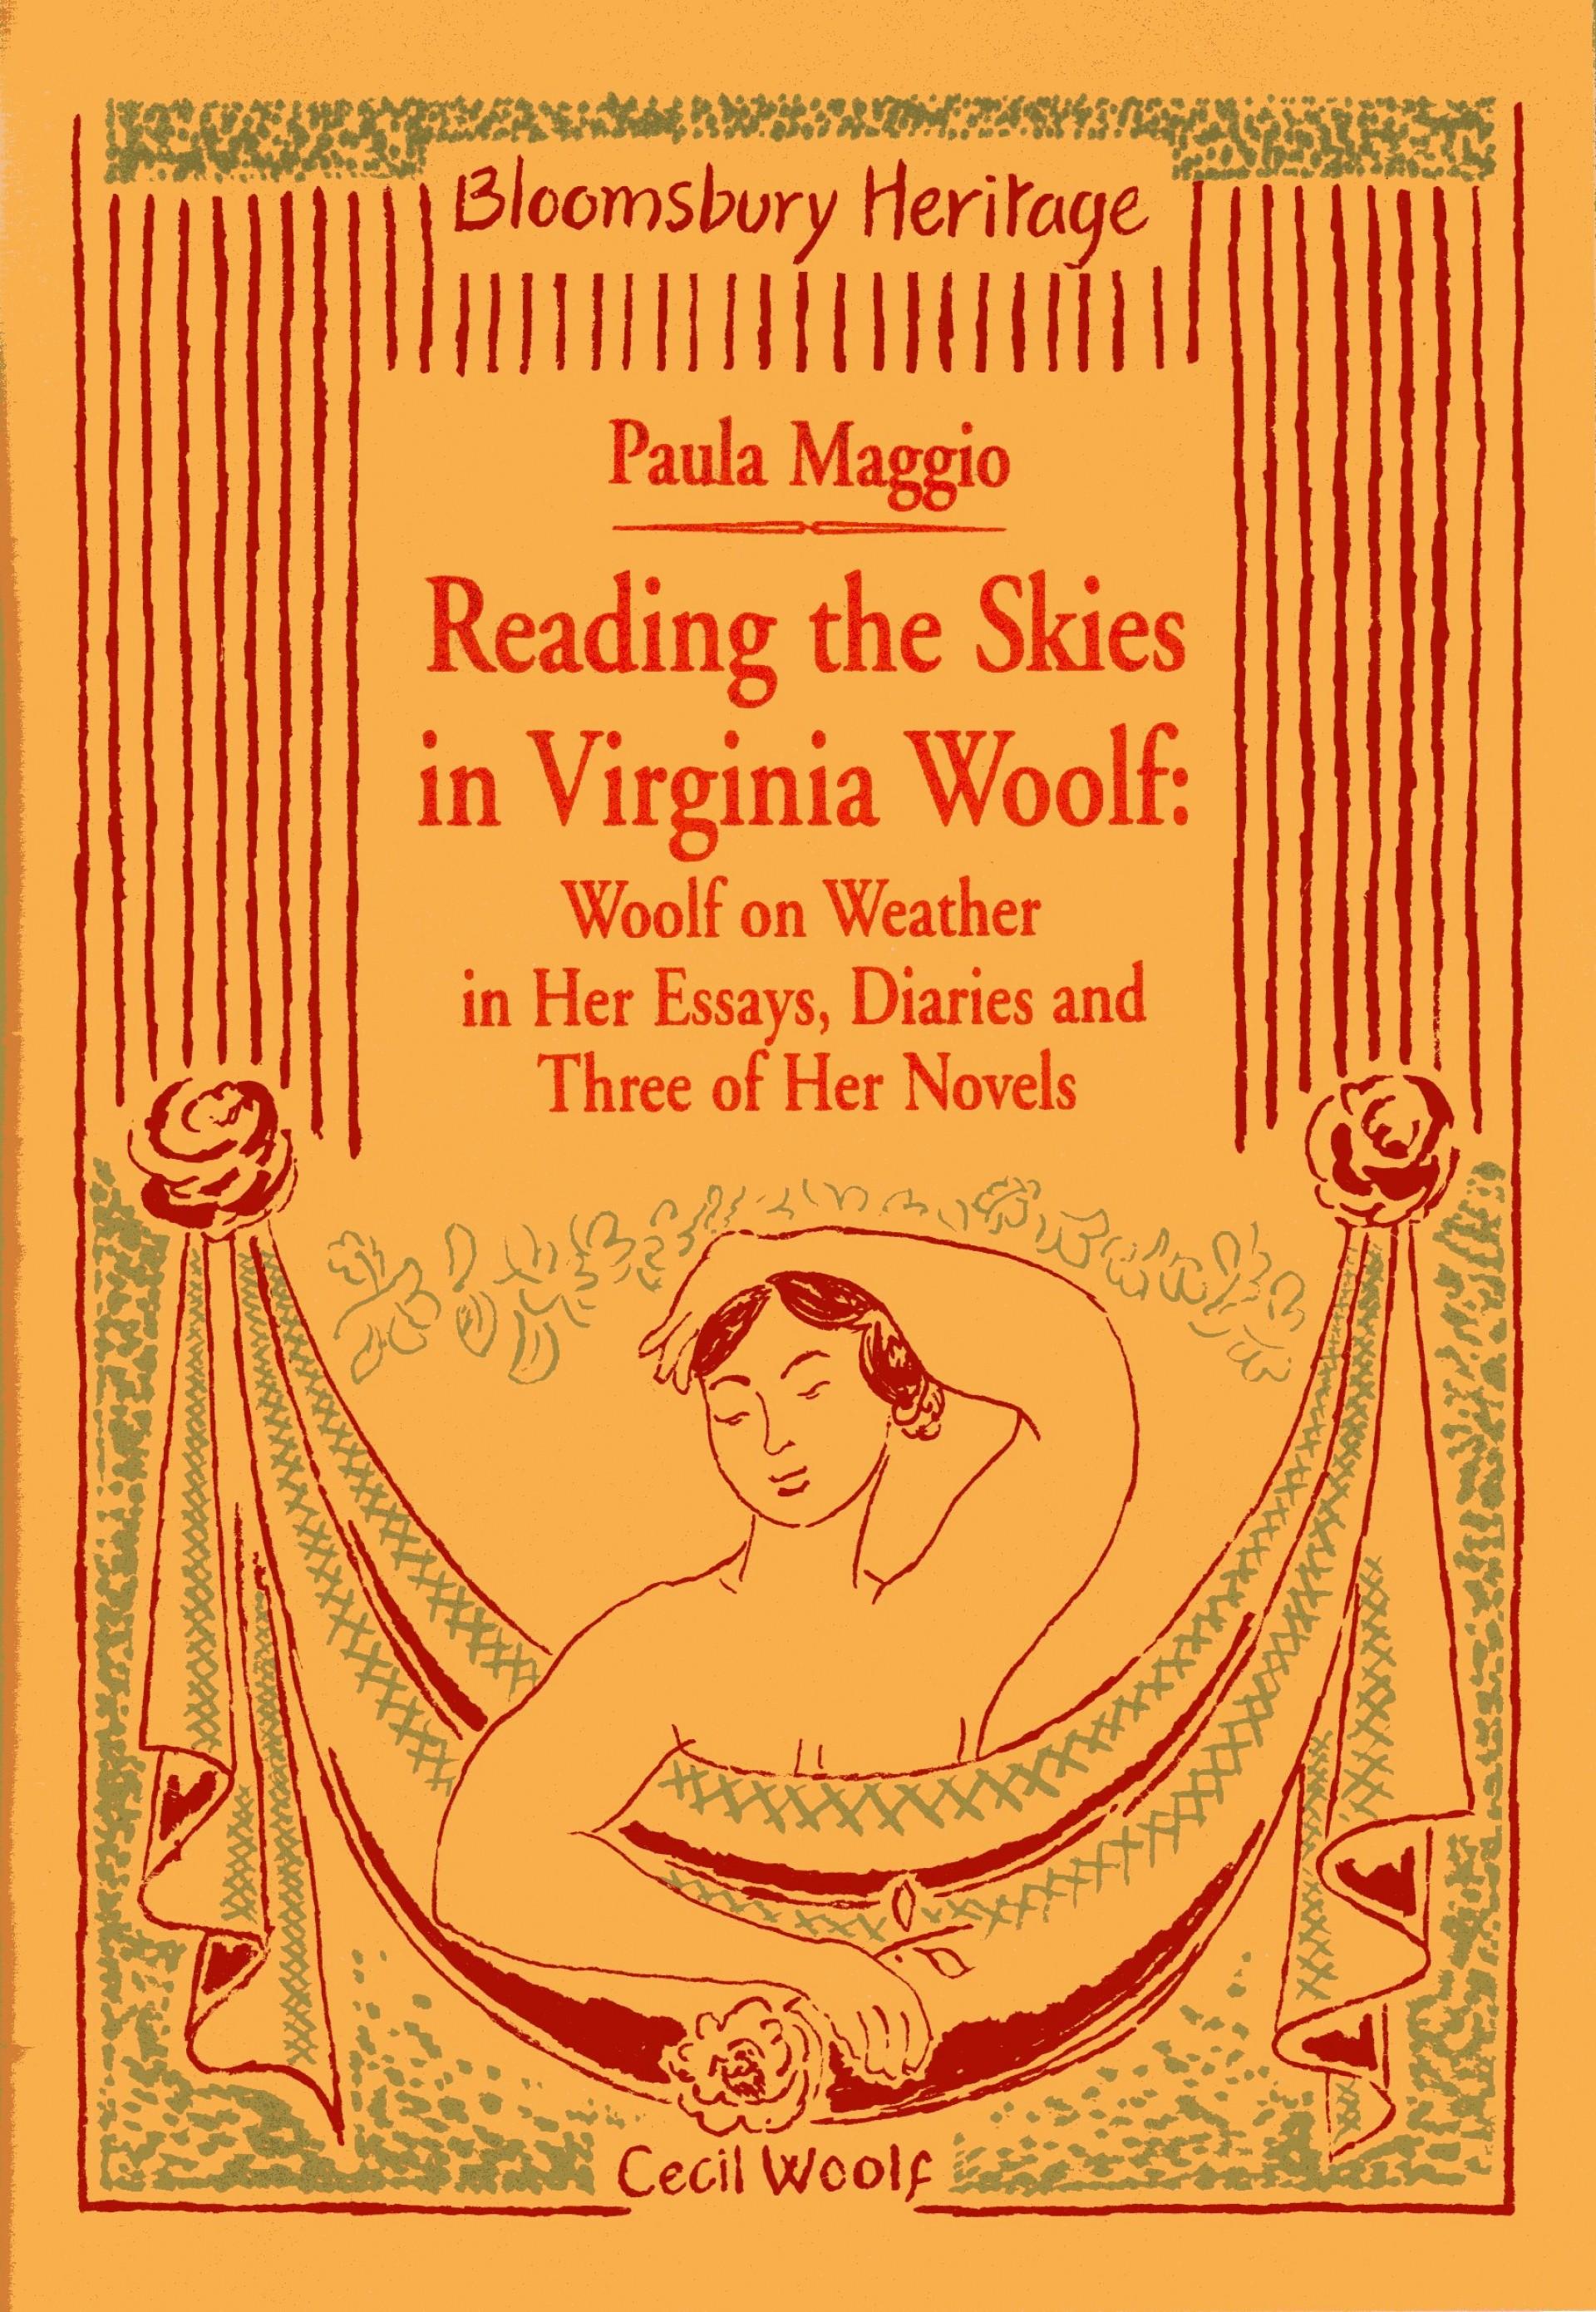 009 Reading The Skies Color016 Essay Example Virginia Woolf Unusual Essays Online Modern Analysis On Self 1920